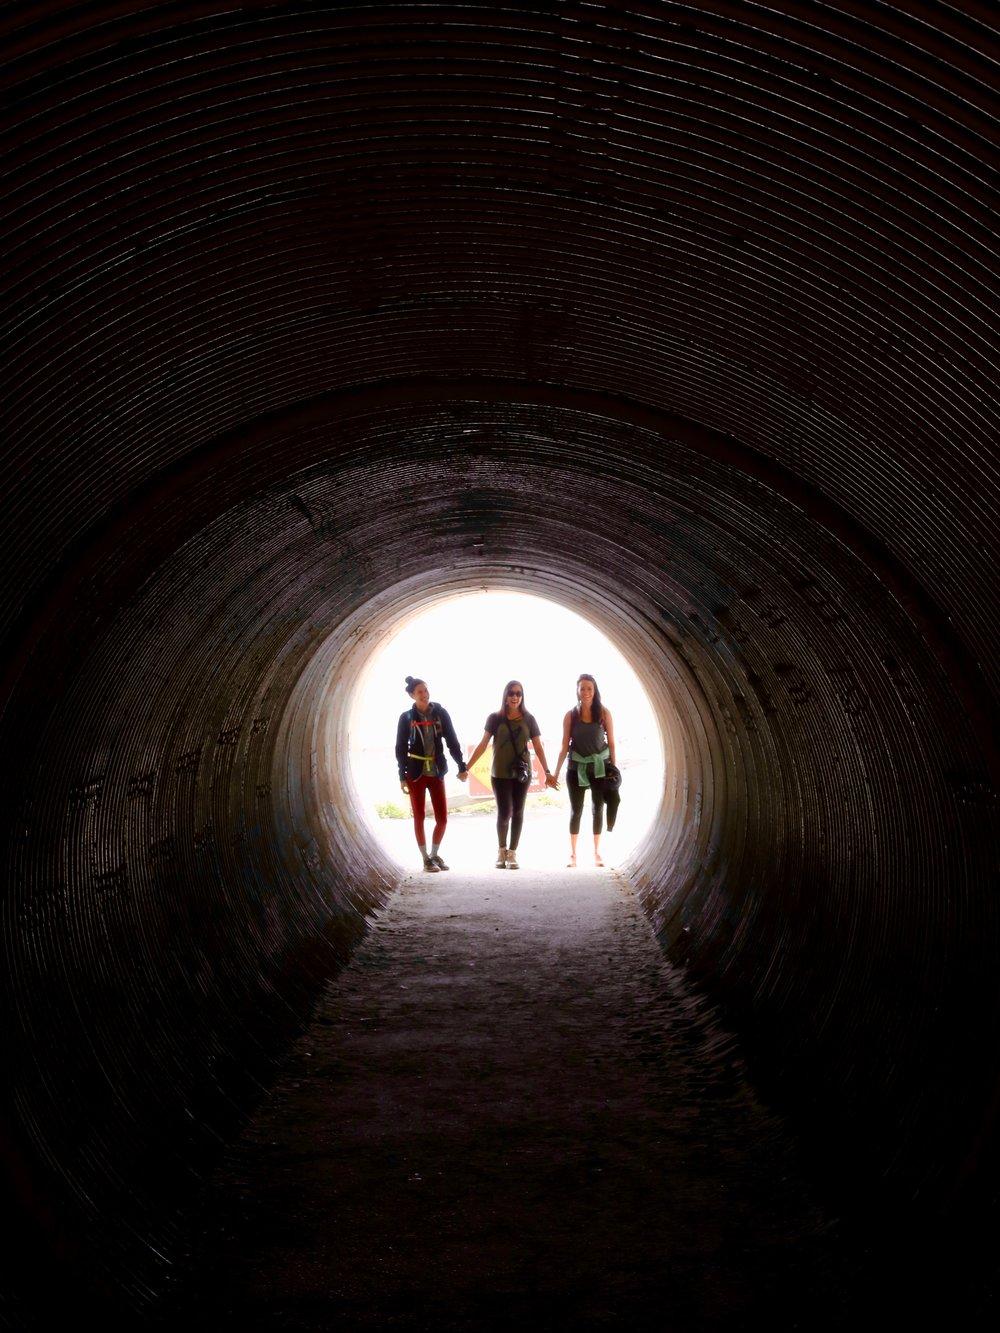 big-sur-julia-pfeiffer-burns-tunnel-view.jpg